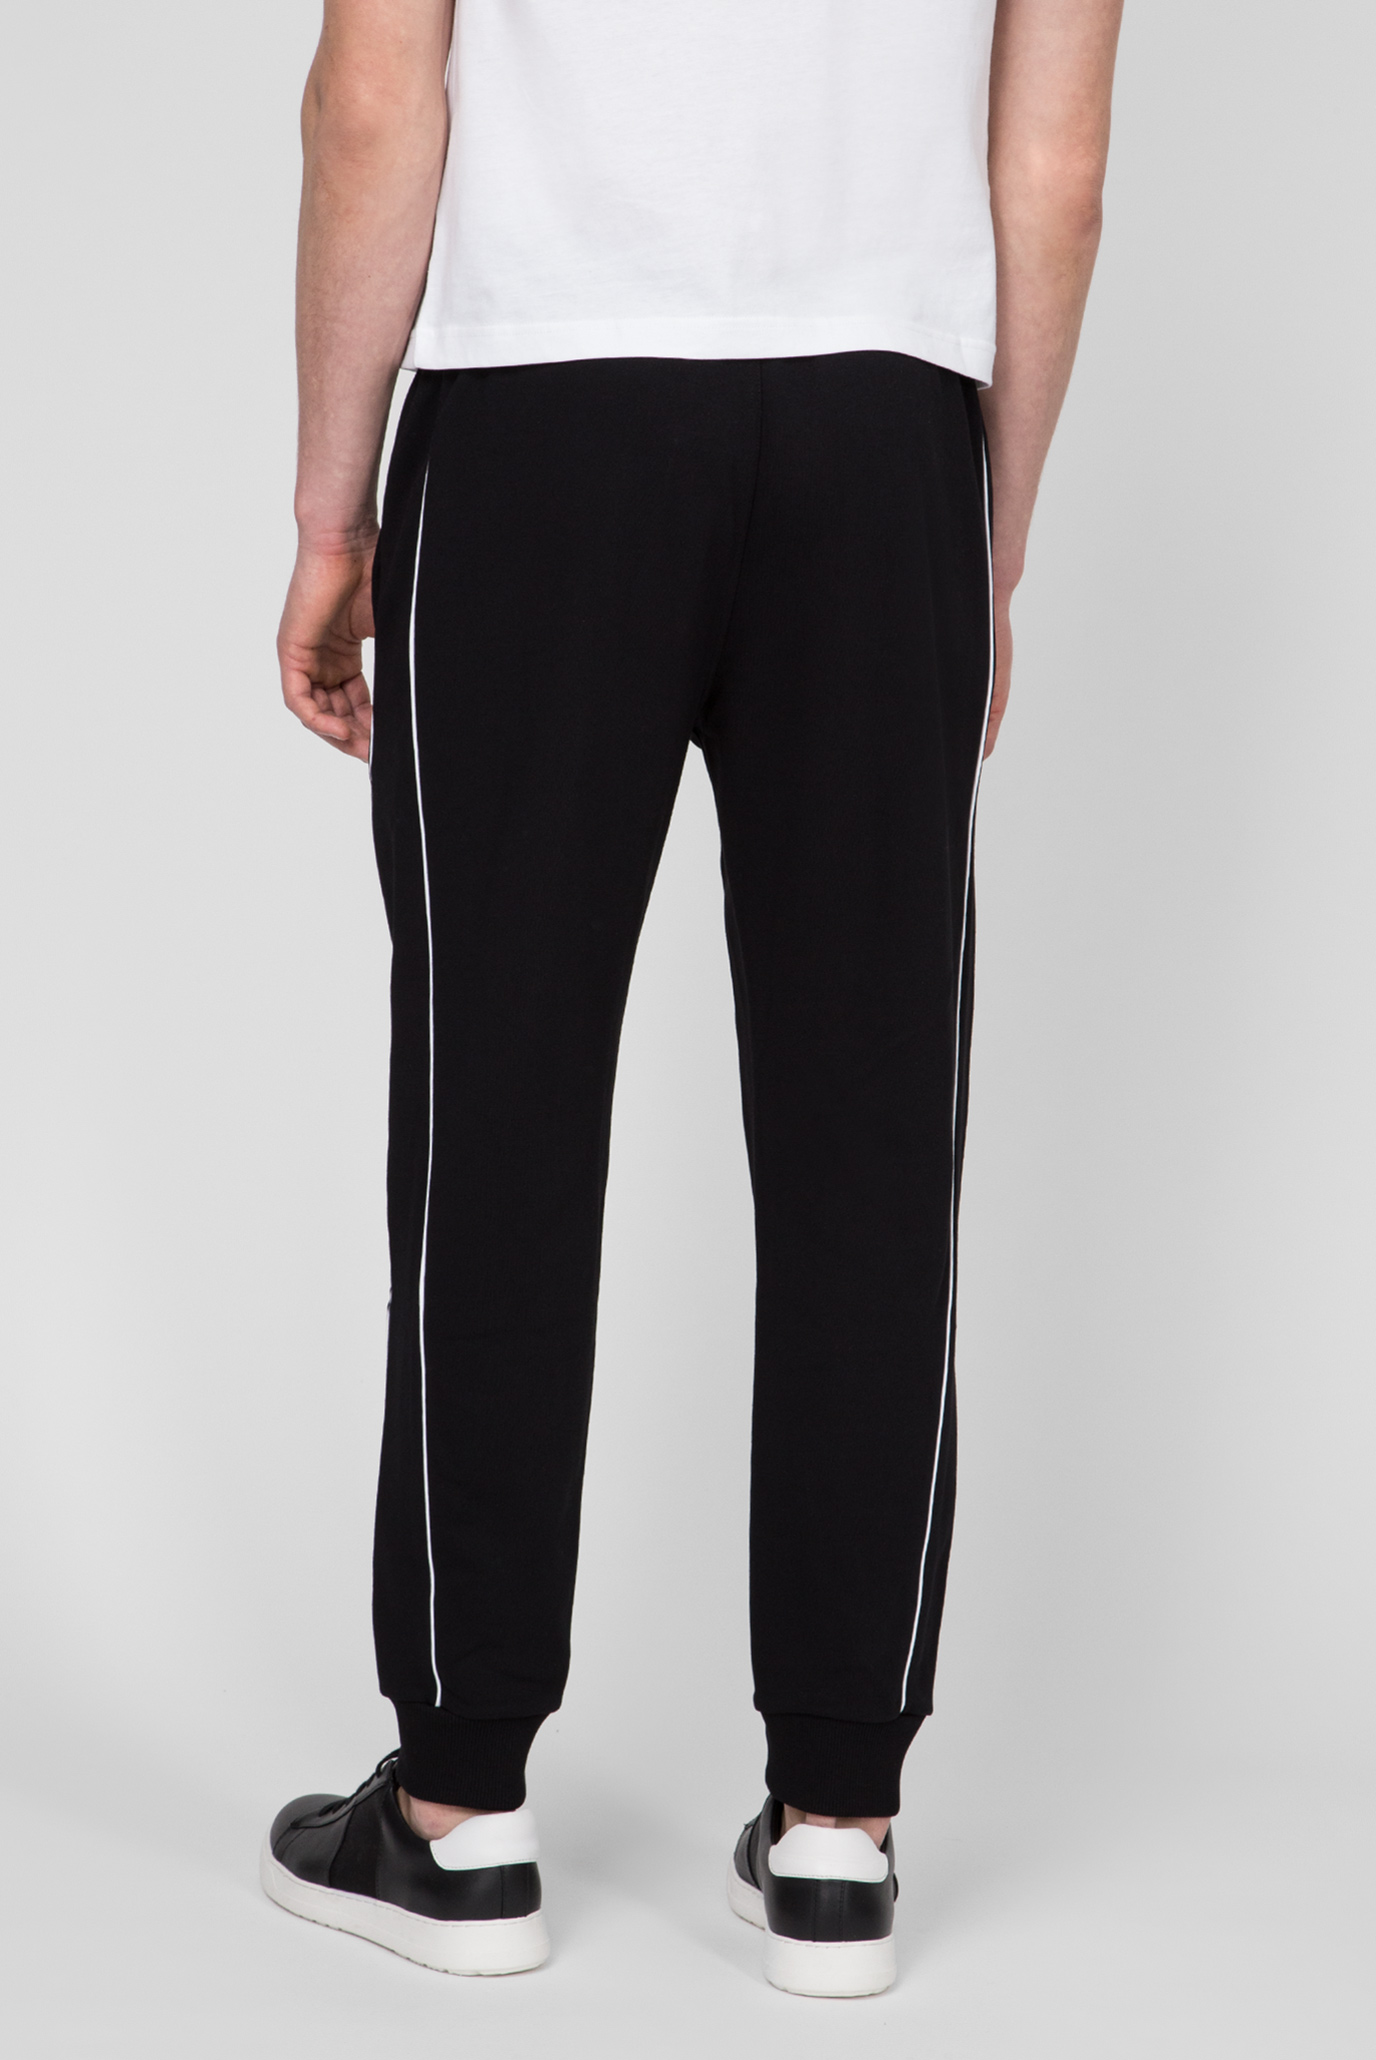 a00c9e0a Купить Мужские черные спортивные брюки LOGO PRINT Calvin Klein Calvin Klein  K10K103382 – Киев, Украина. Цены в ...